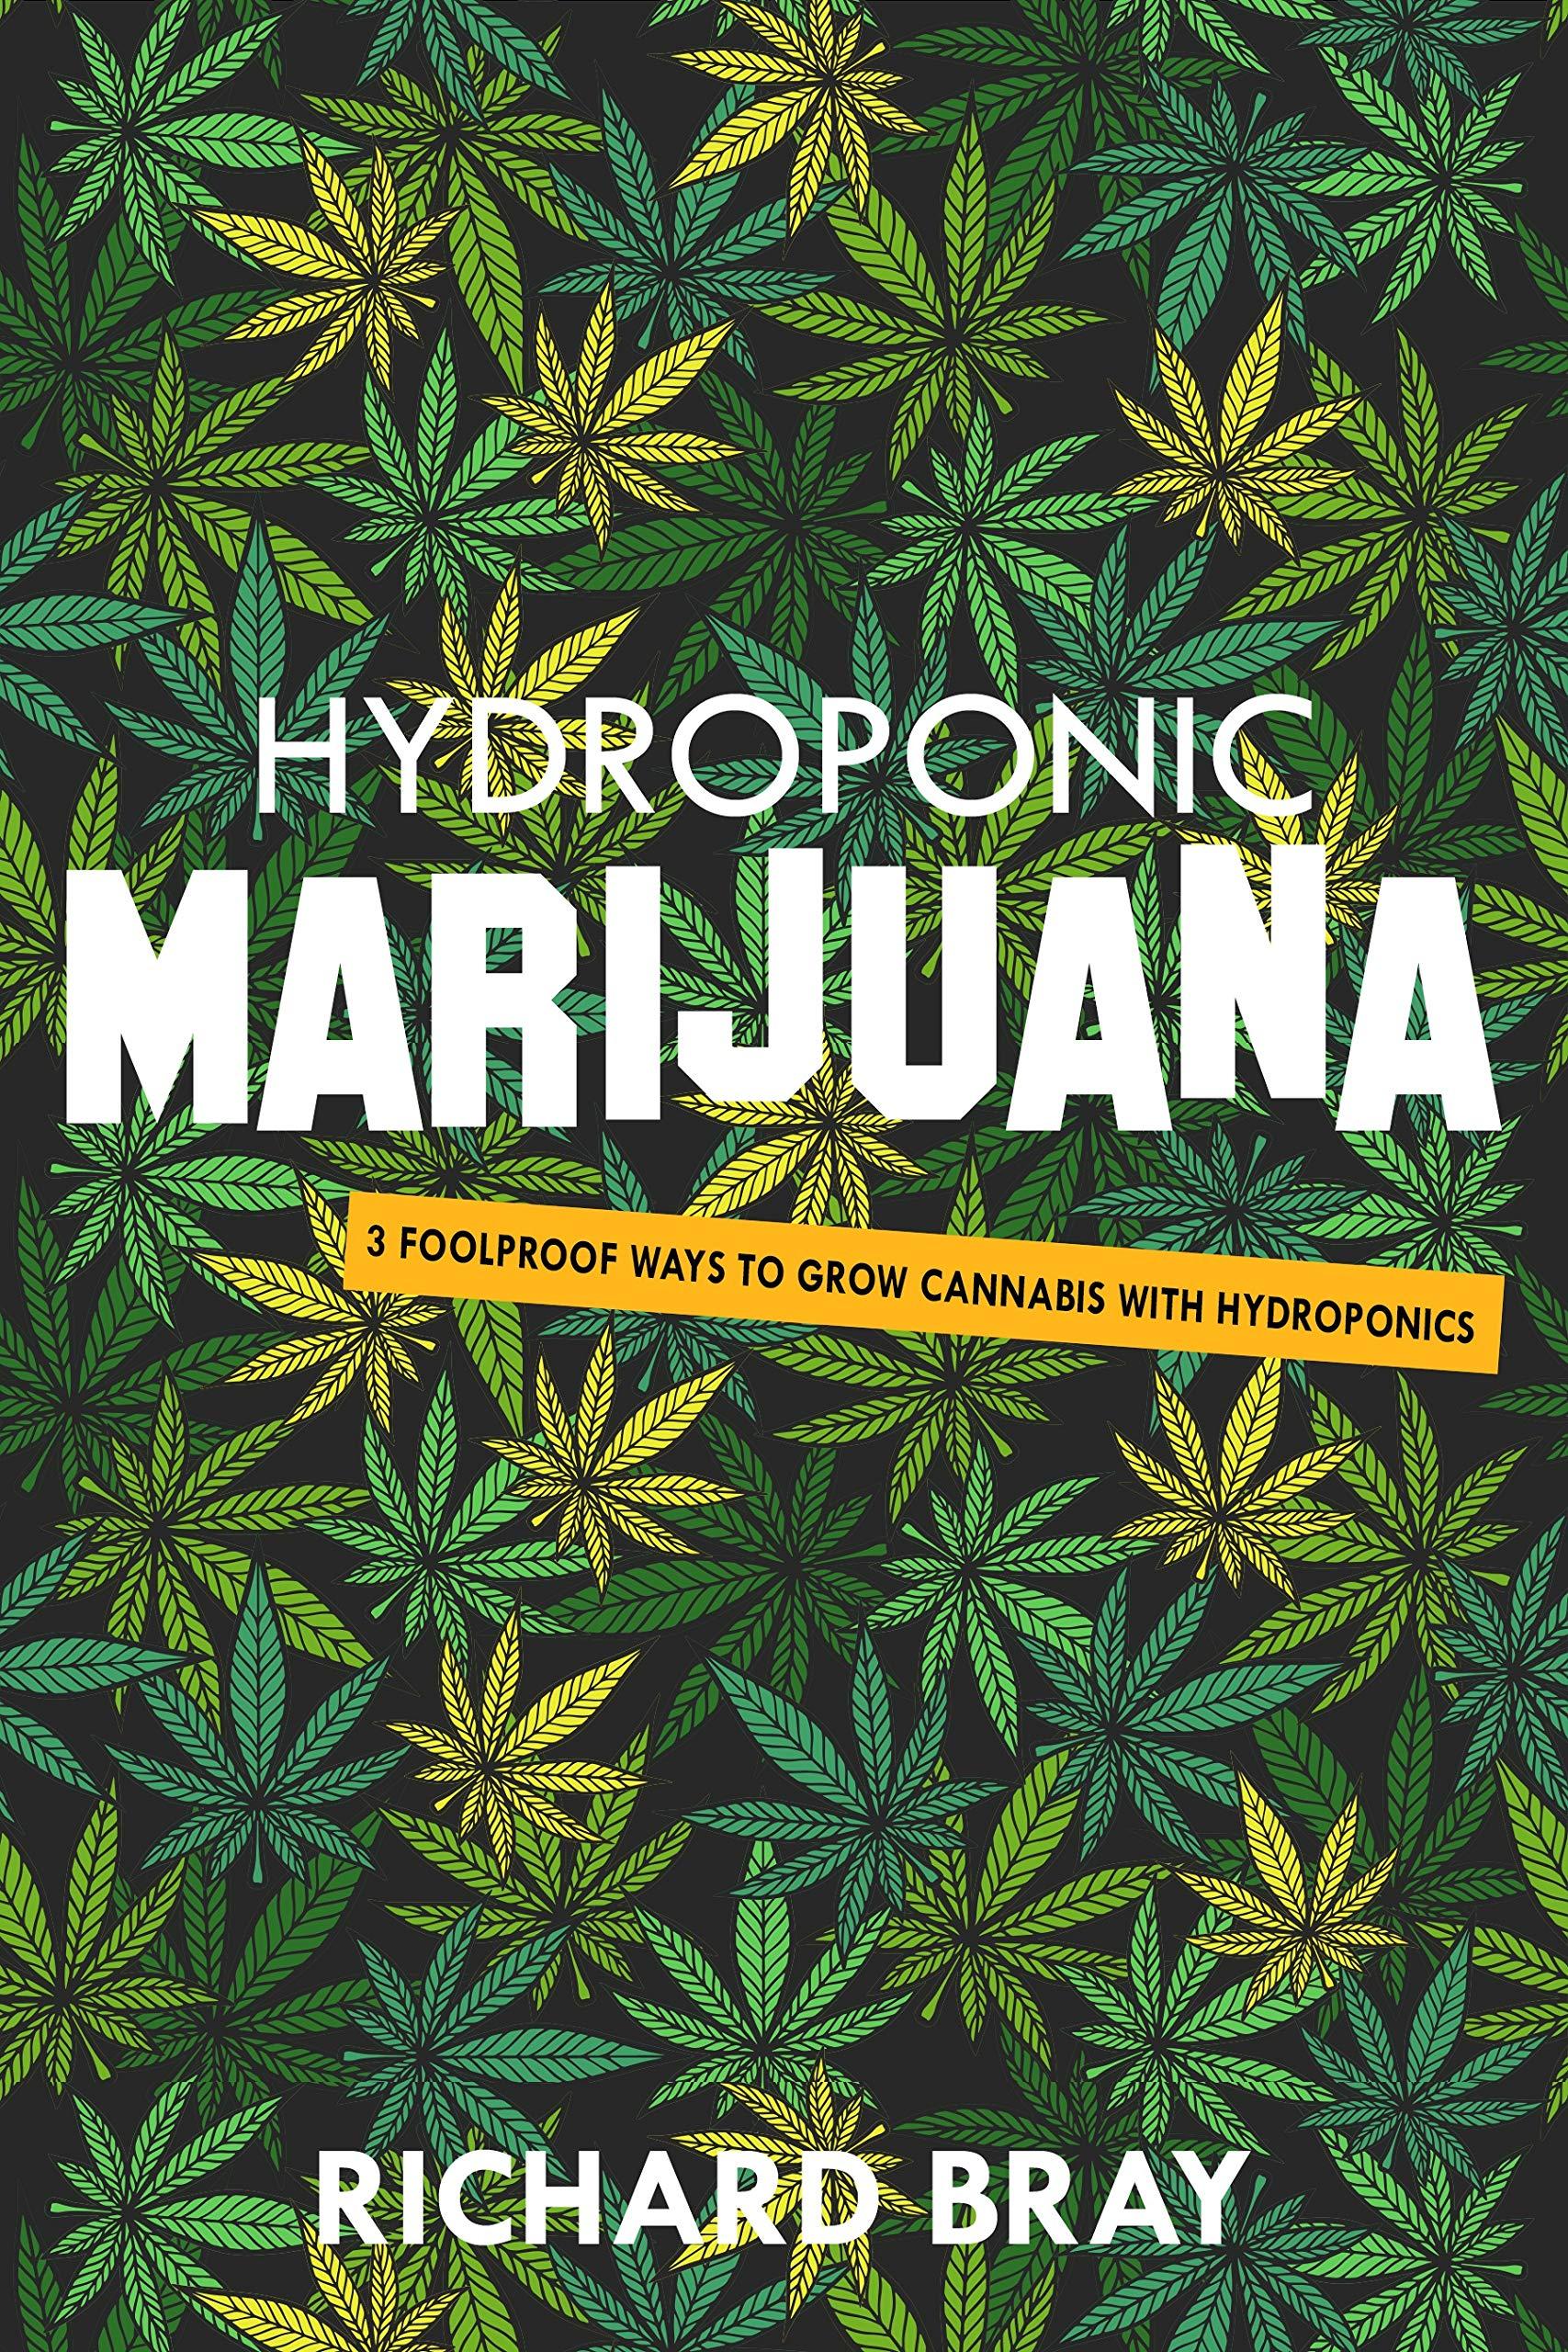 Hydroponic Marijuana  3 Foolproof Ways To Grow Cannabis With Hydroponics  Urban Homesteading Book 5   English Edition